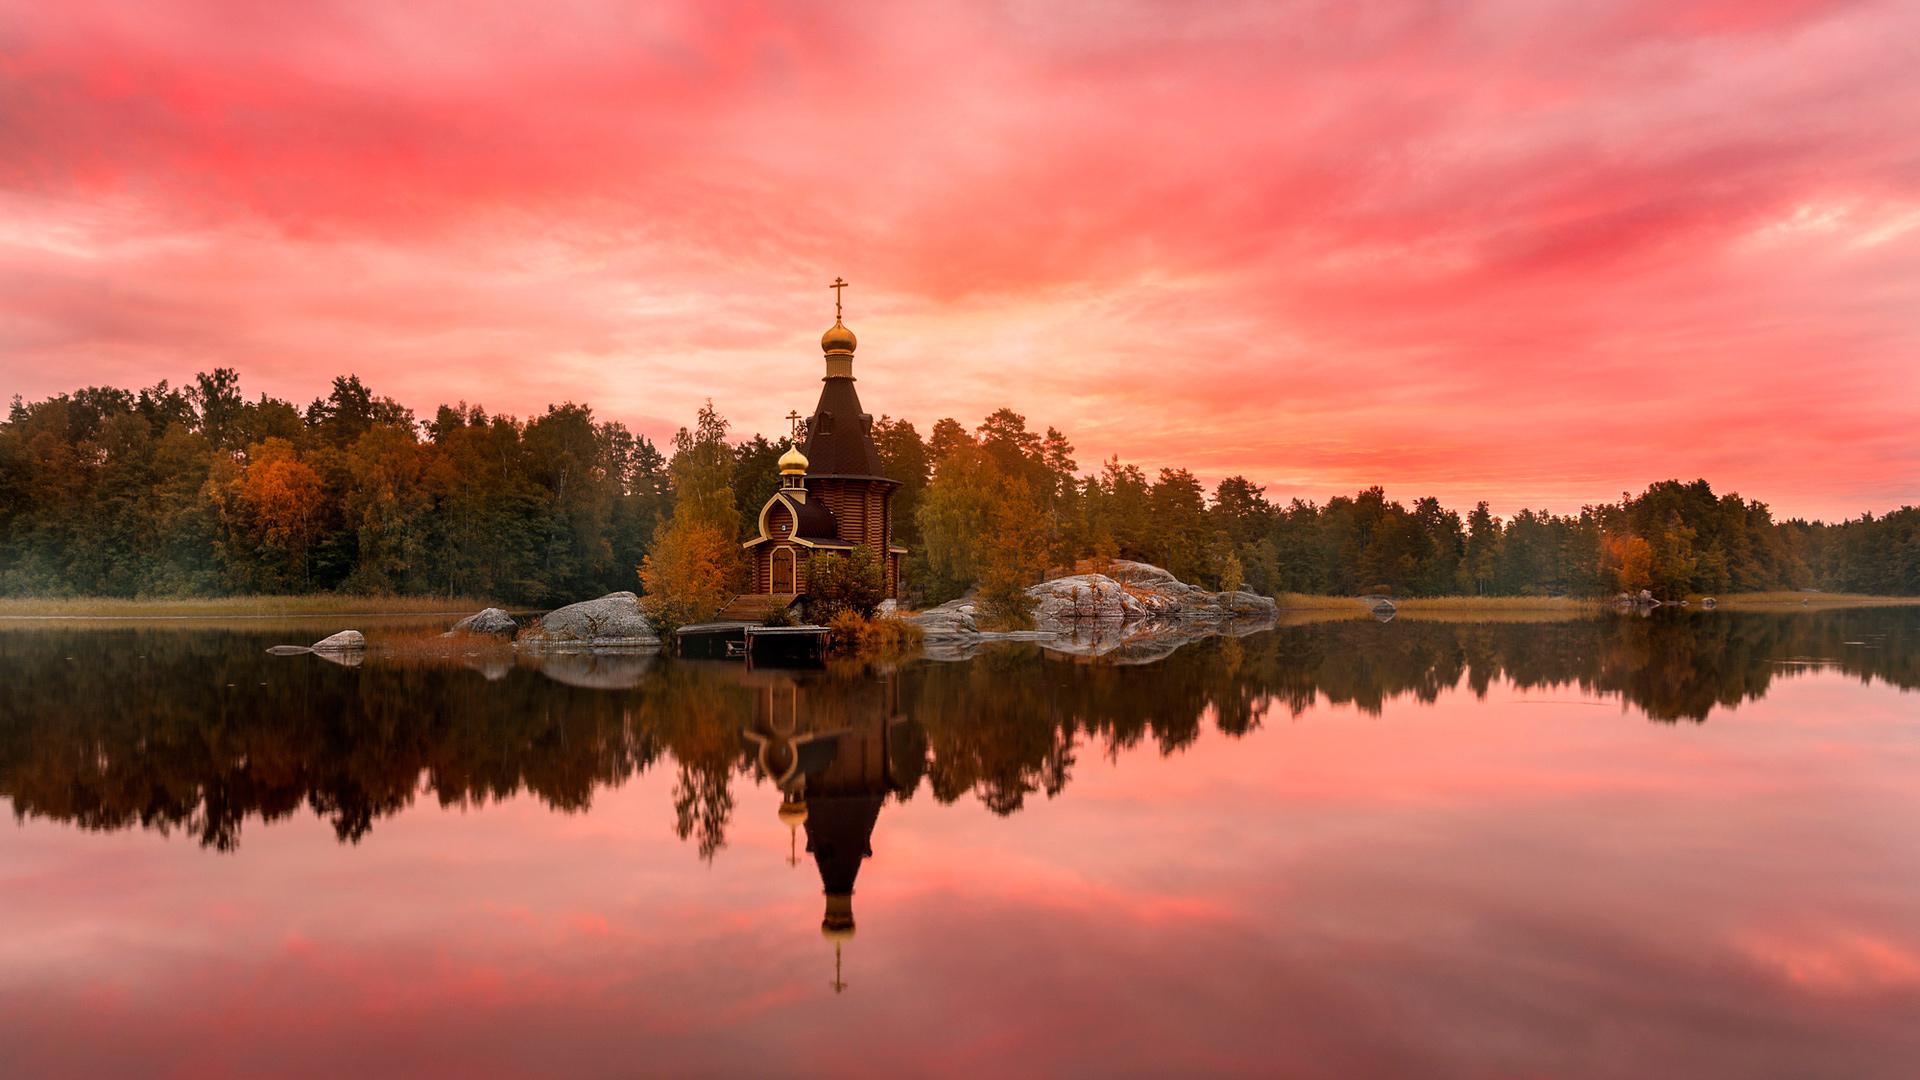 церковь в закате дня